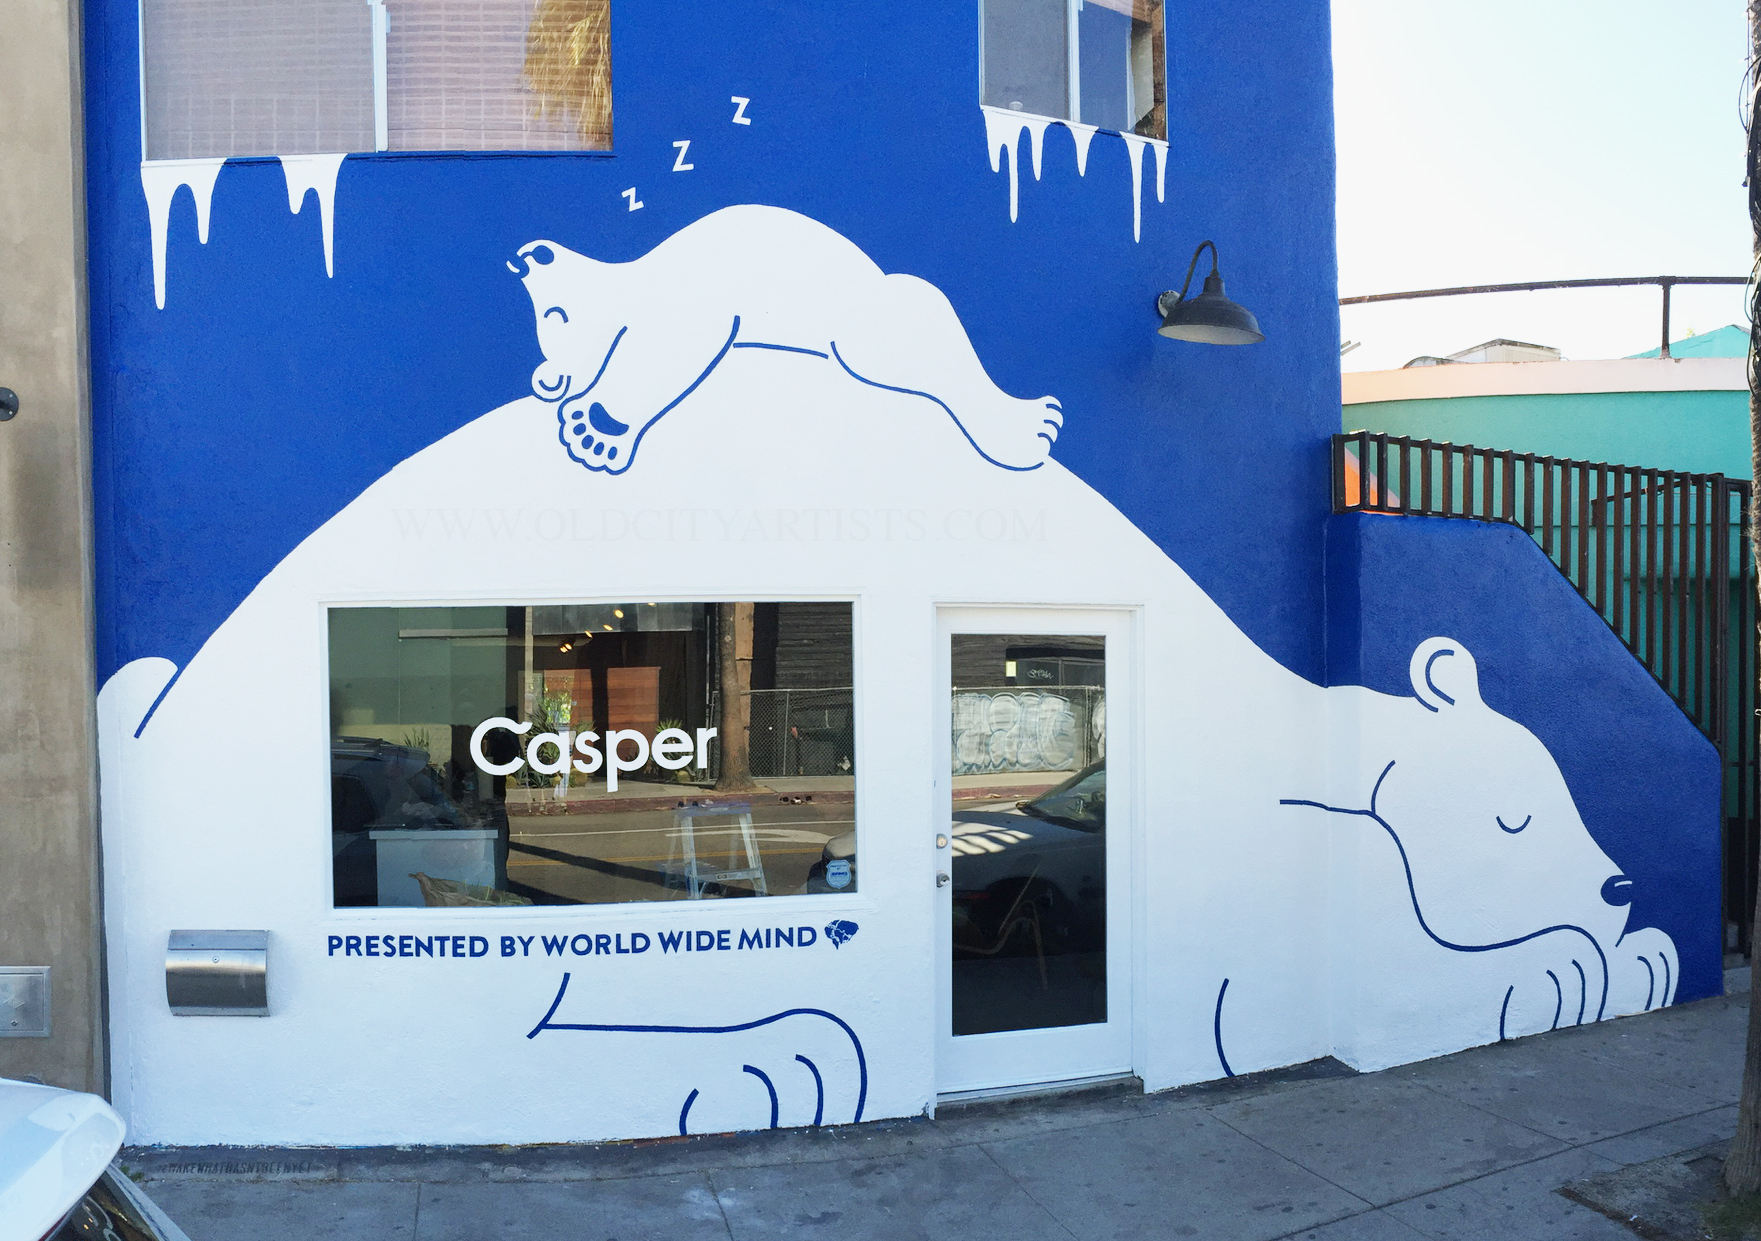 Casper Bedding